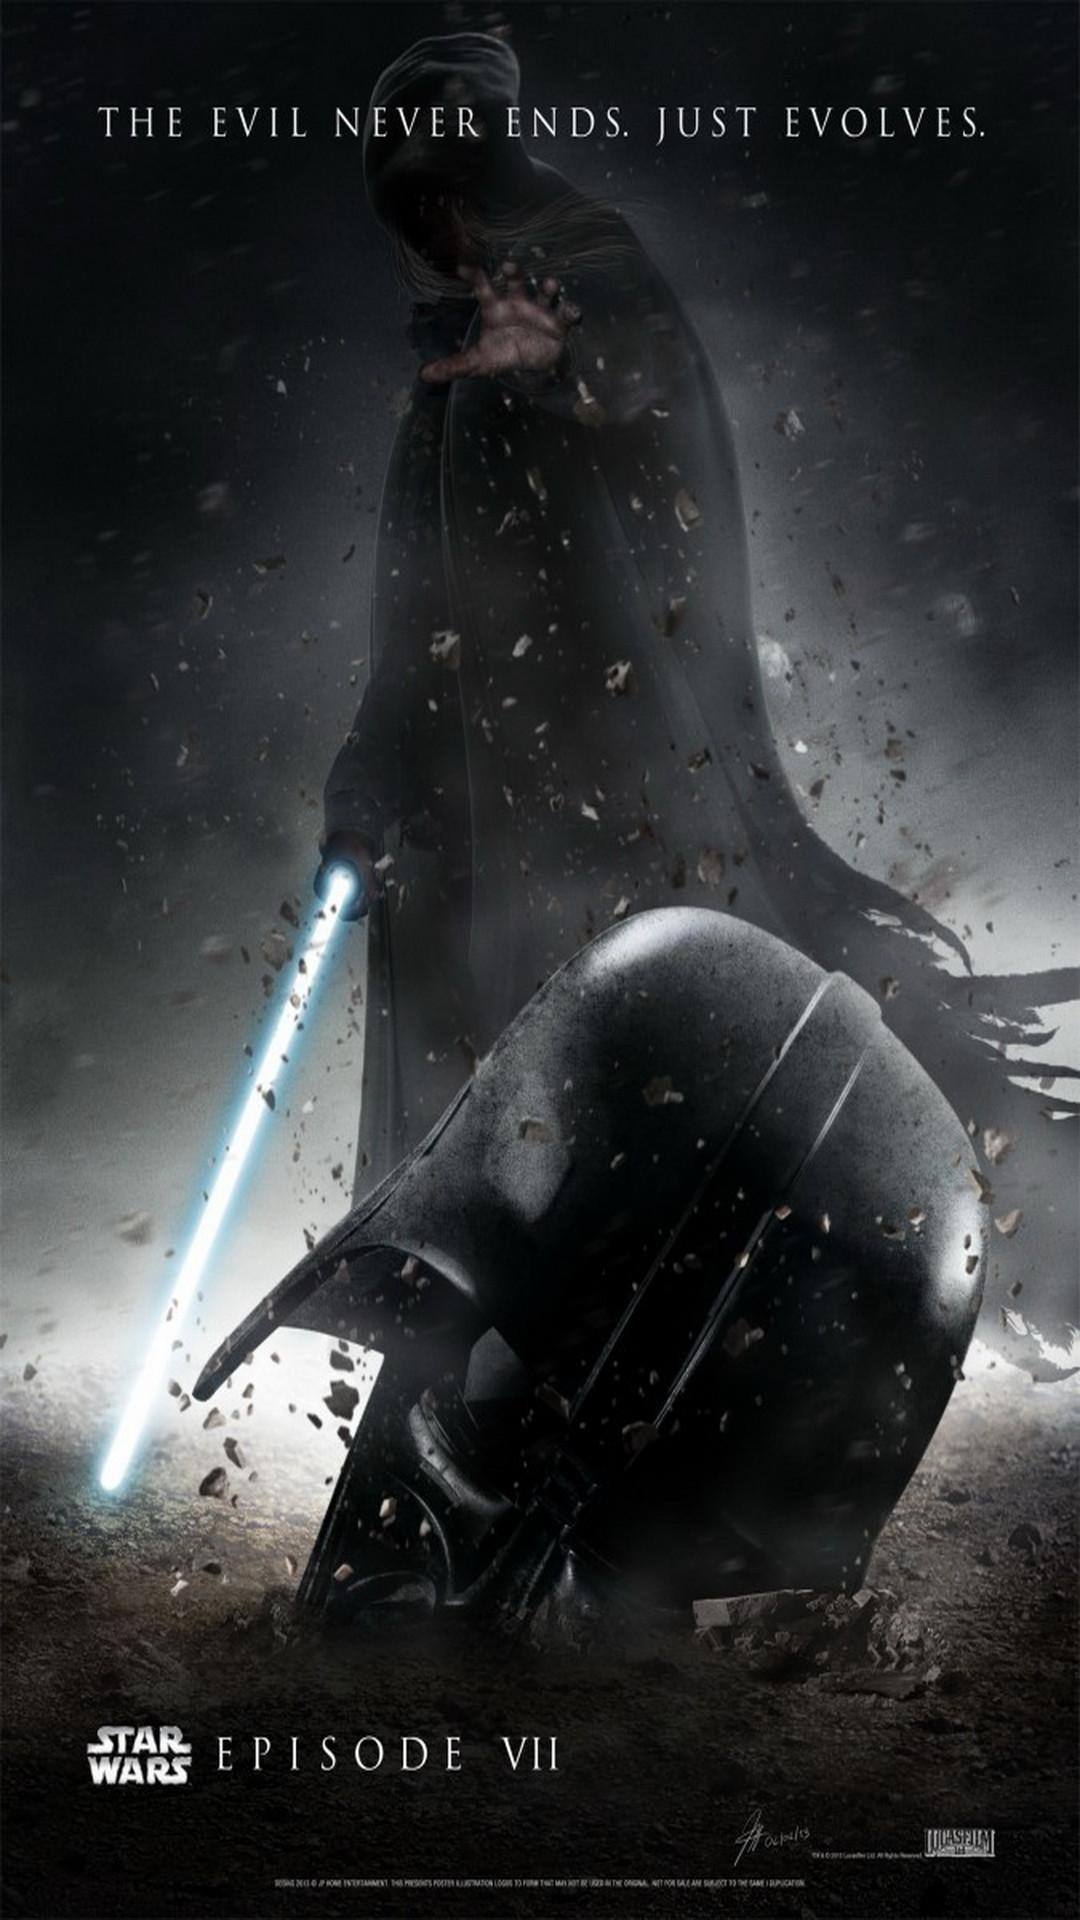 Star Wars Hd Wallpaper Phone 63 Images